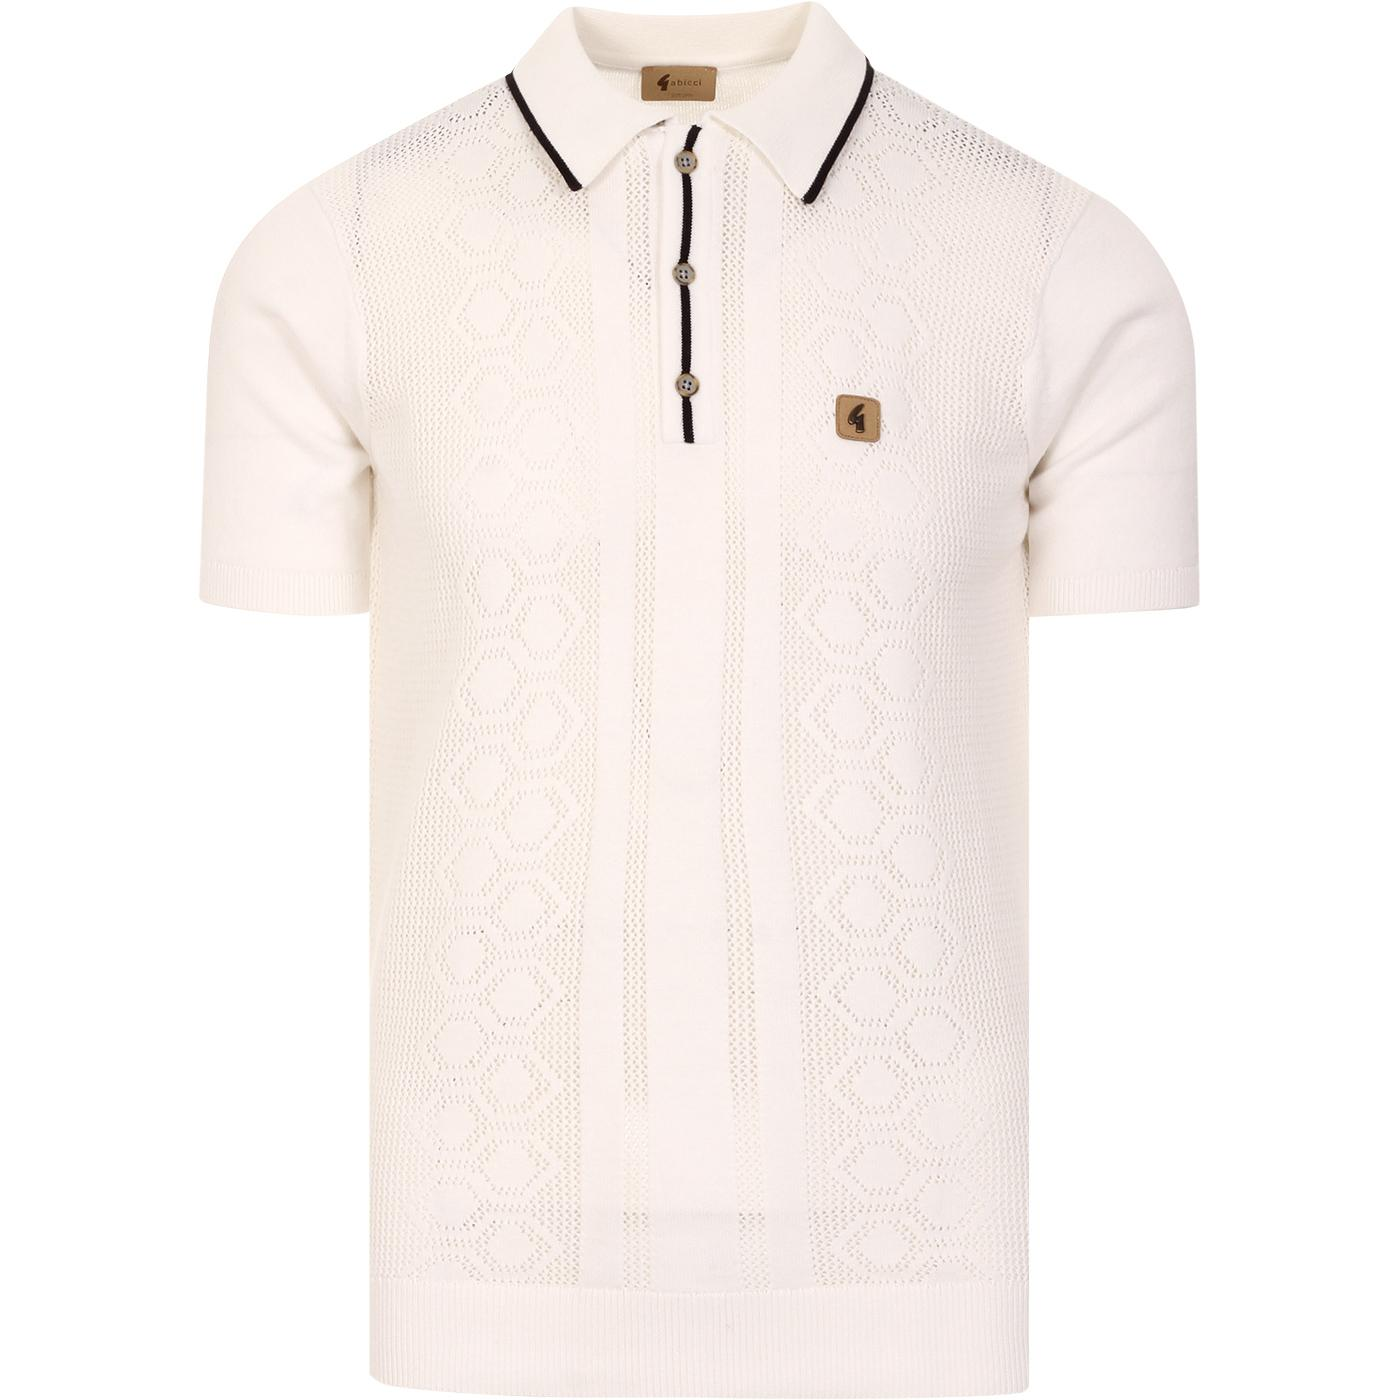 Bronson GABICCI VINTAGE Pointelle Knit Polo WHITE